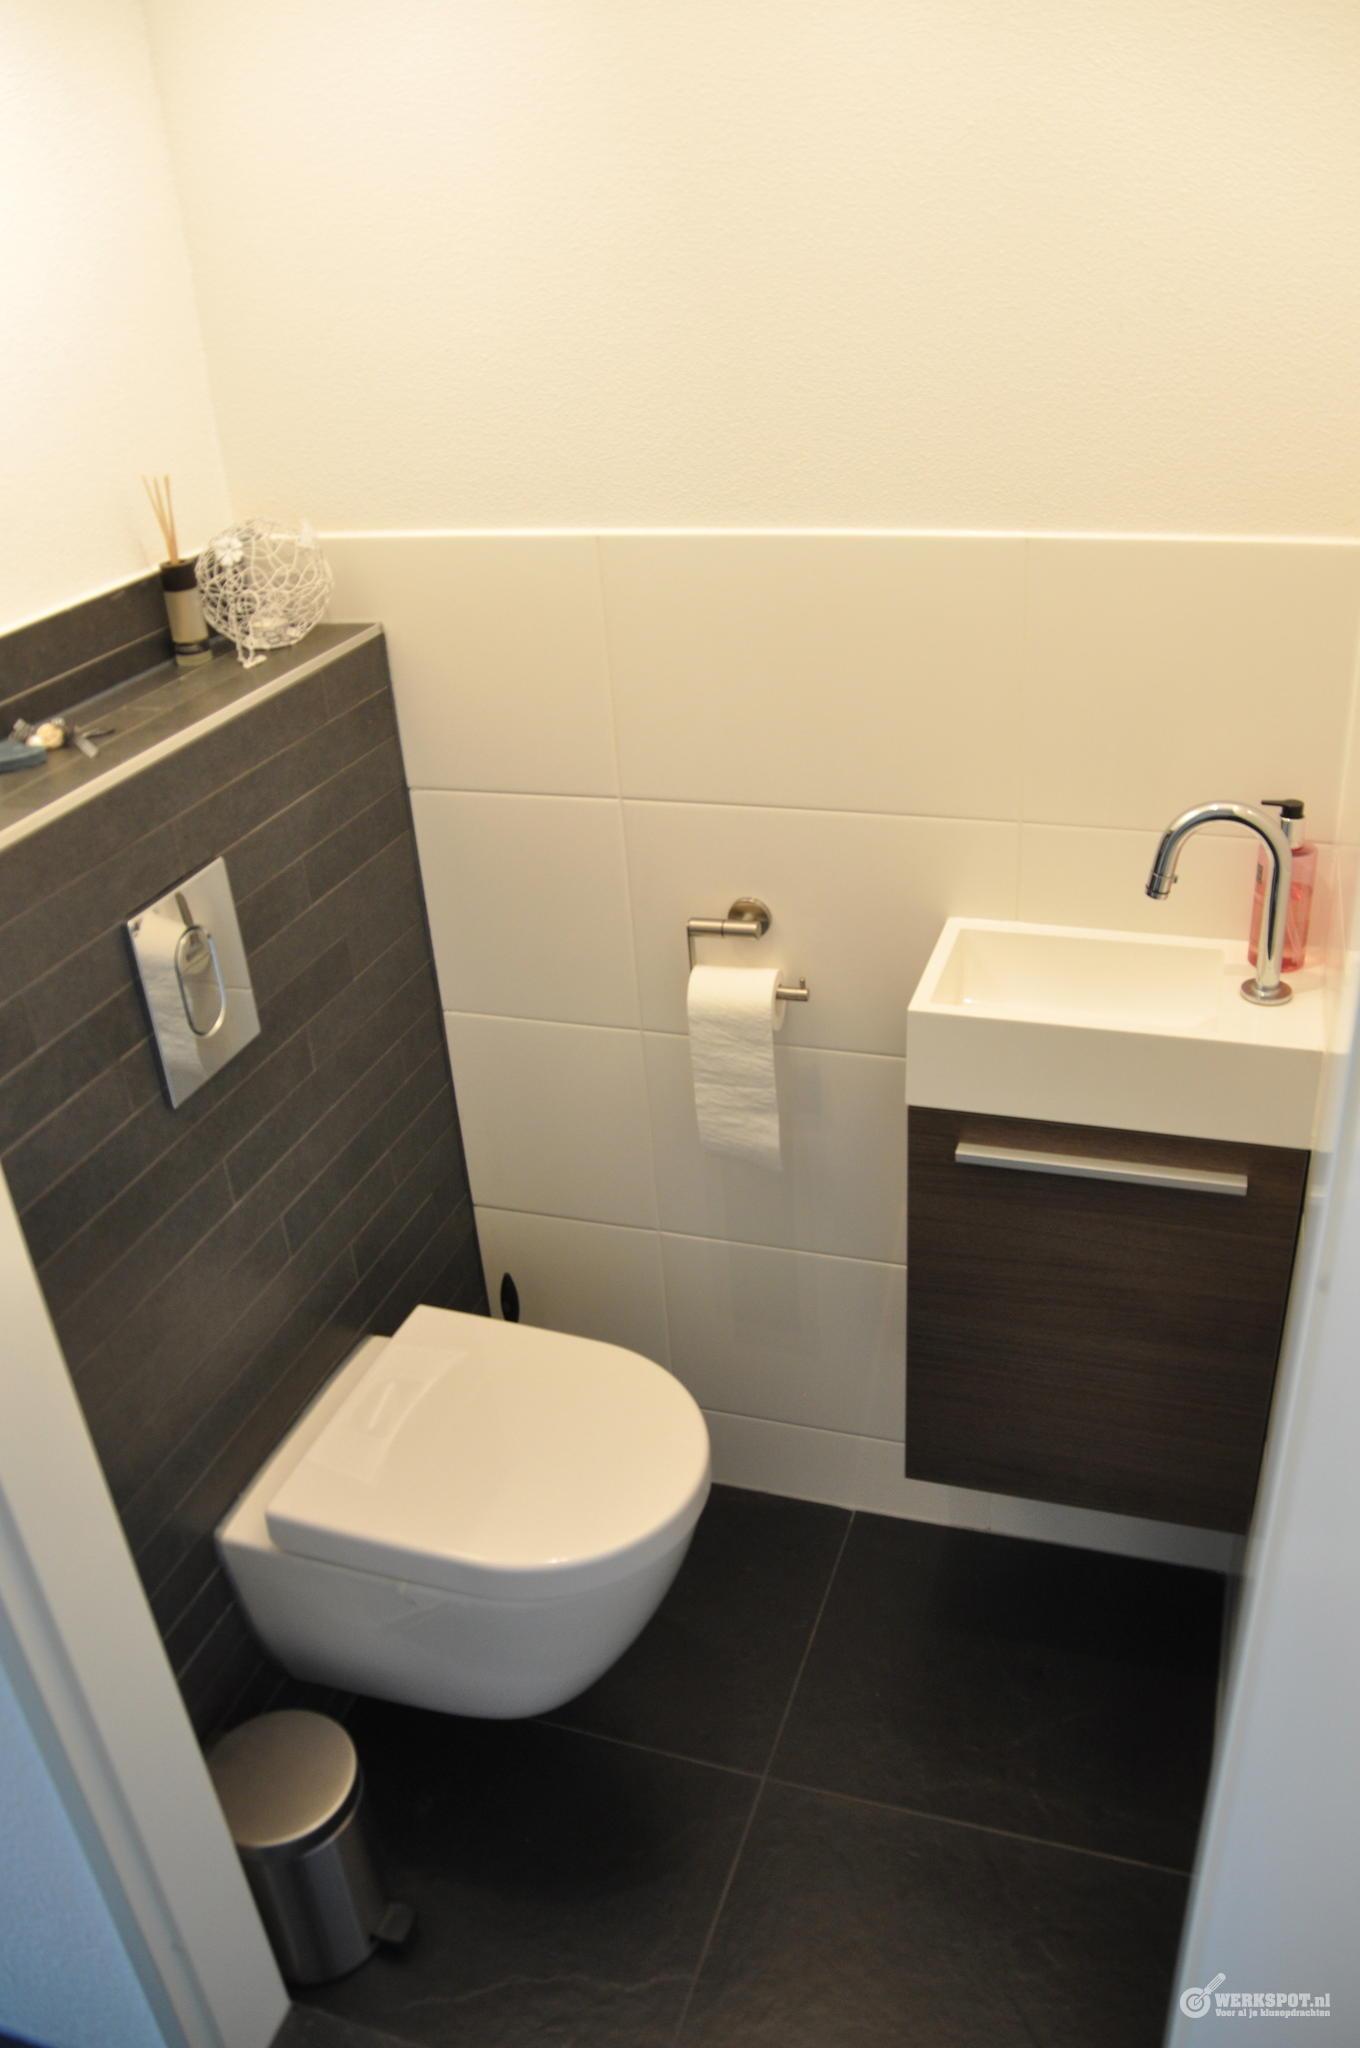 Betegelen badkamer en toilet - Werkspot